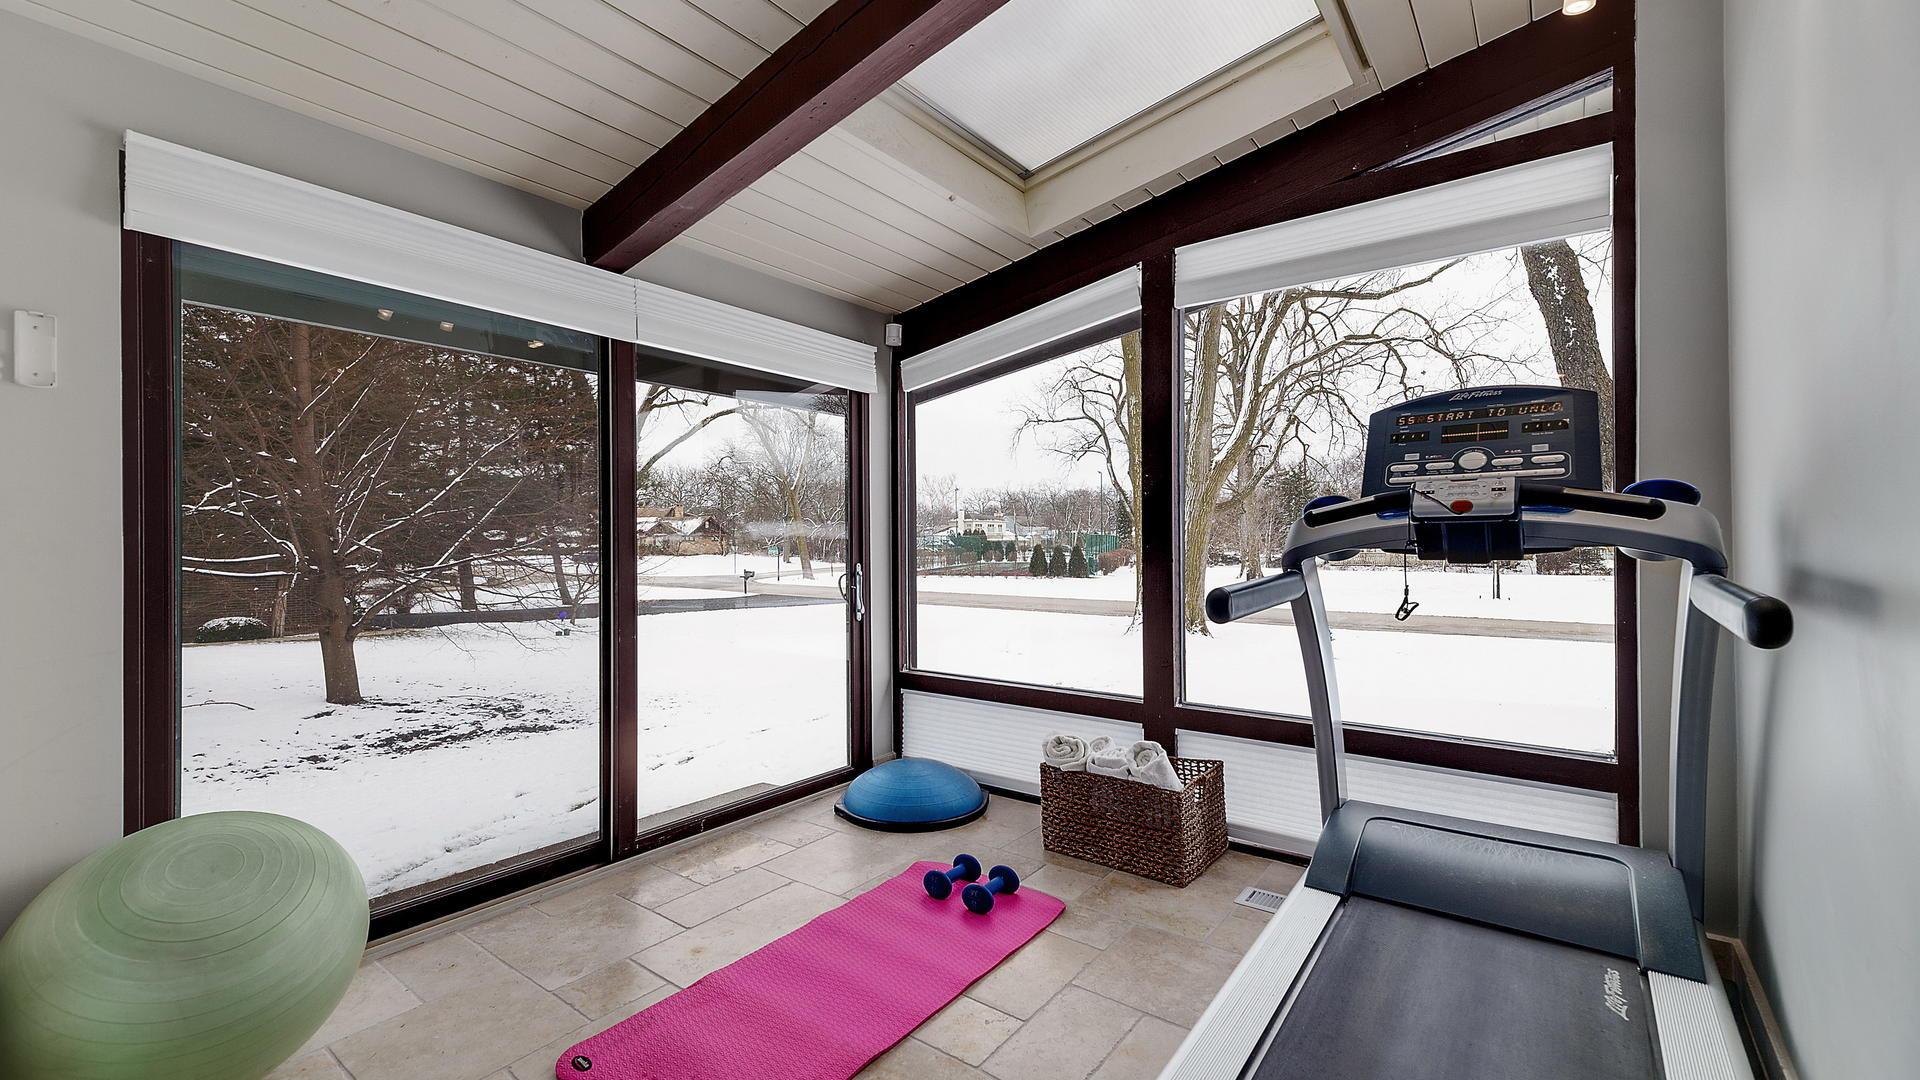 324 Timber View, Oak Brook, Illinois, 60523